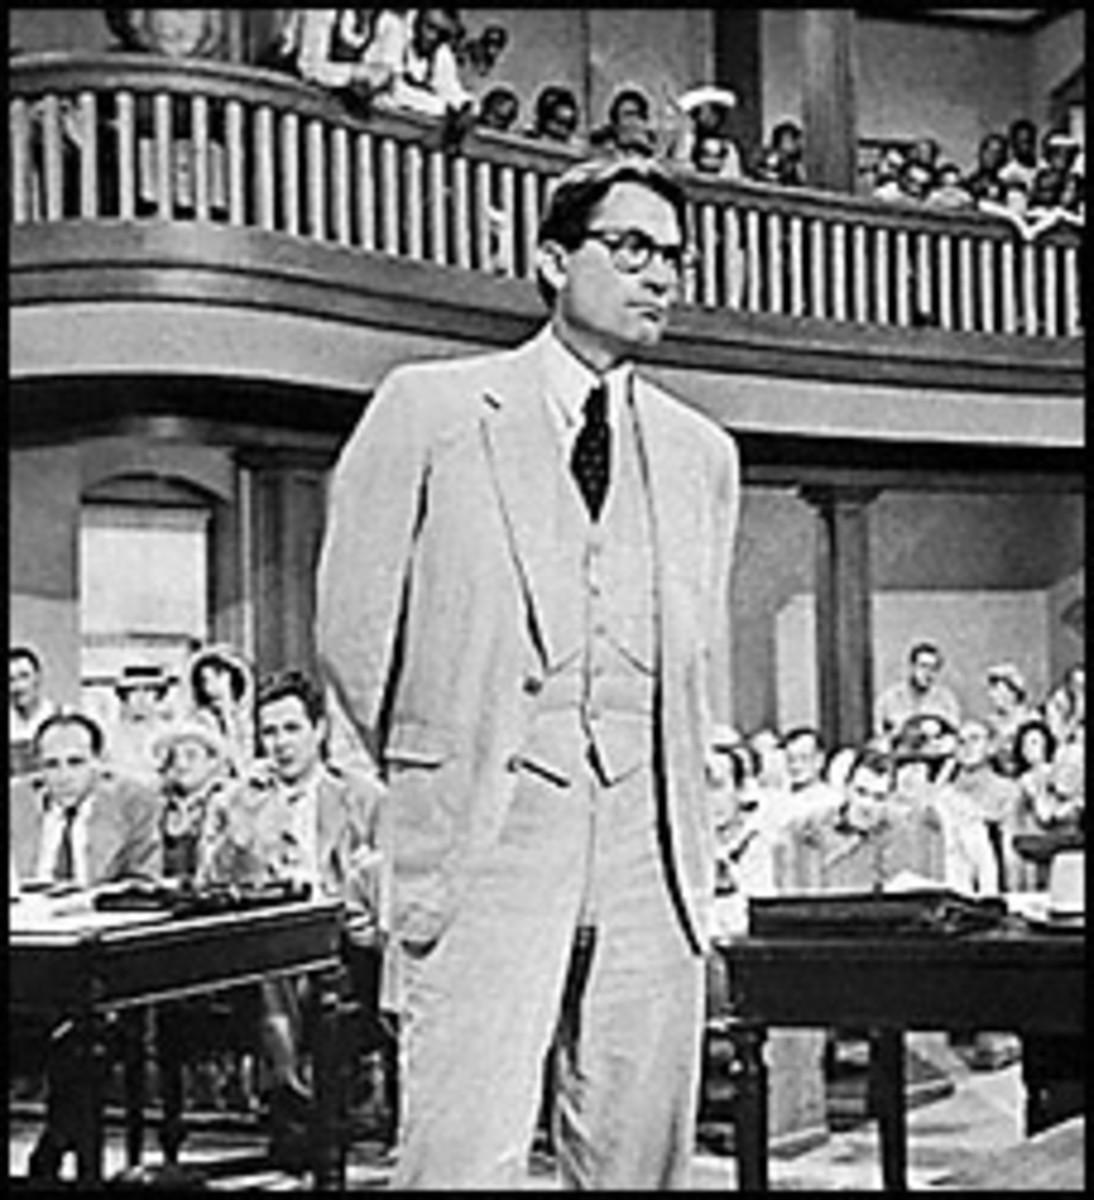 As Atticus Finch